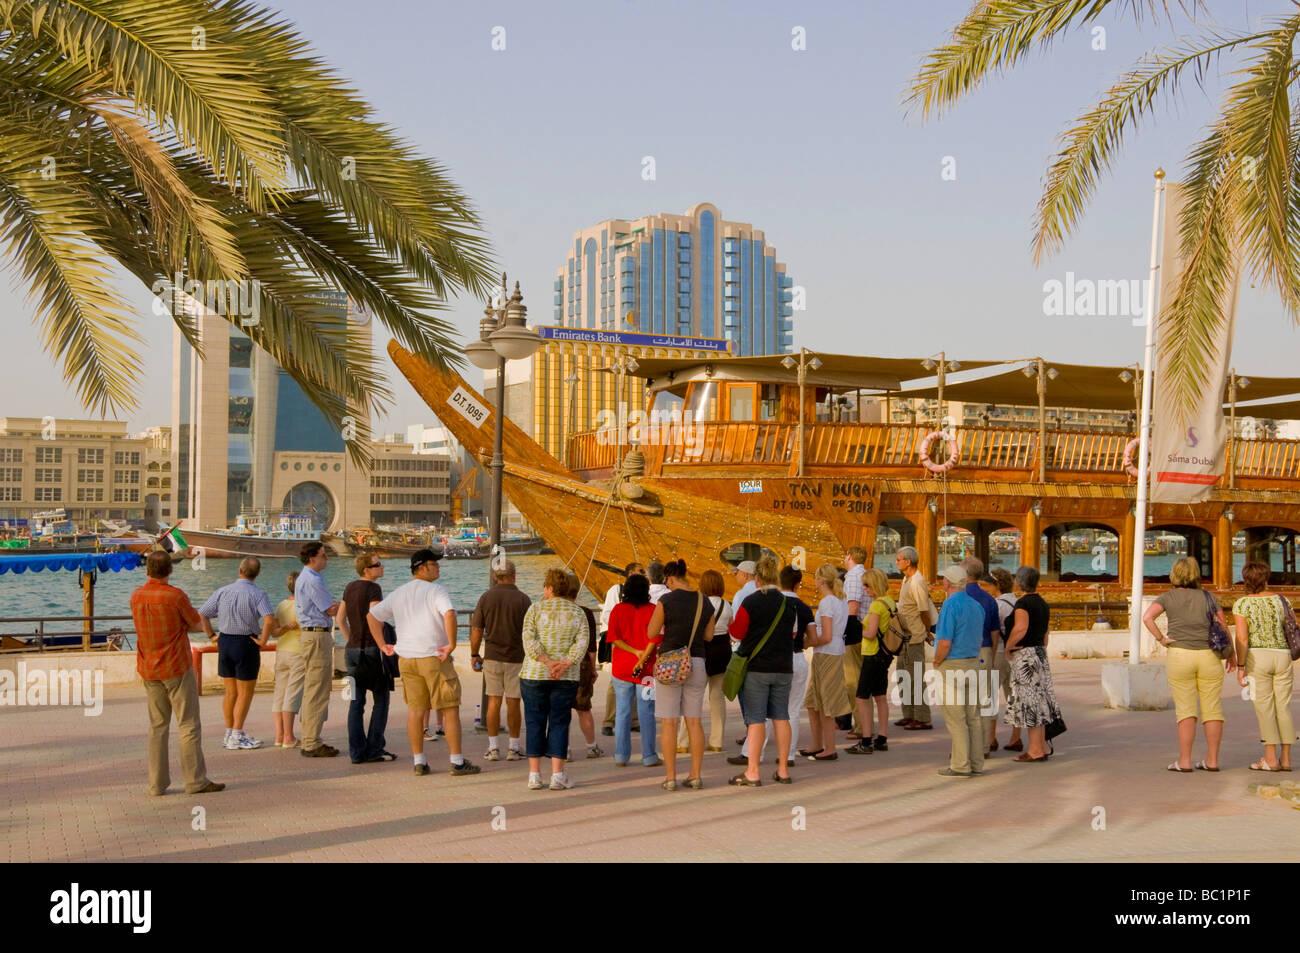 Foreign Tourists group on the Bur Dubai Waterfront - Stock Image